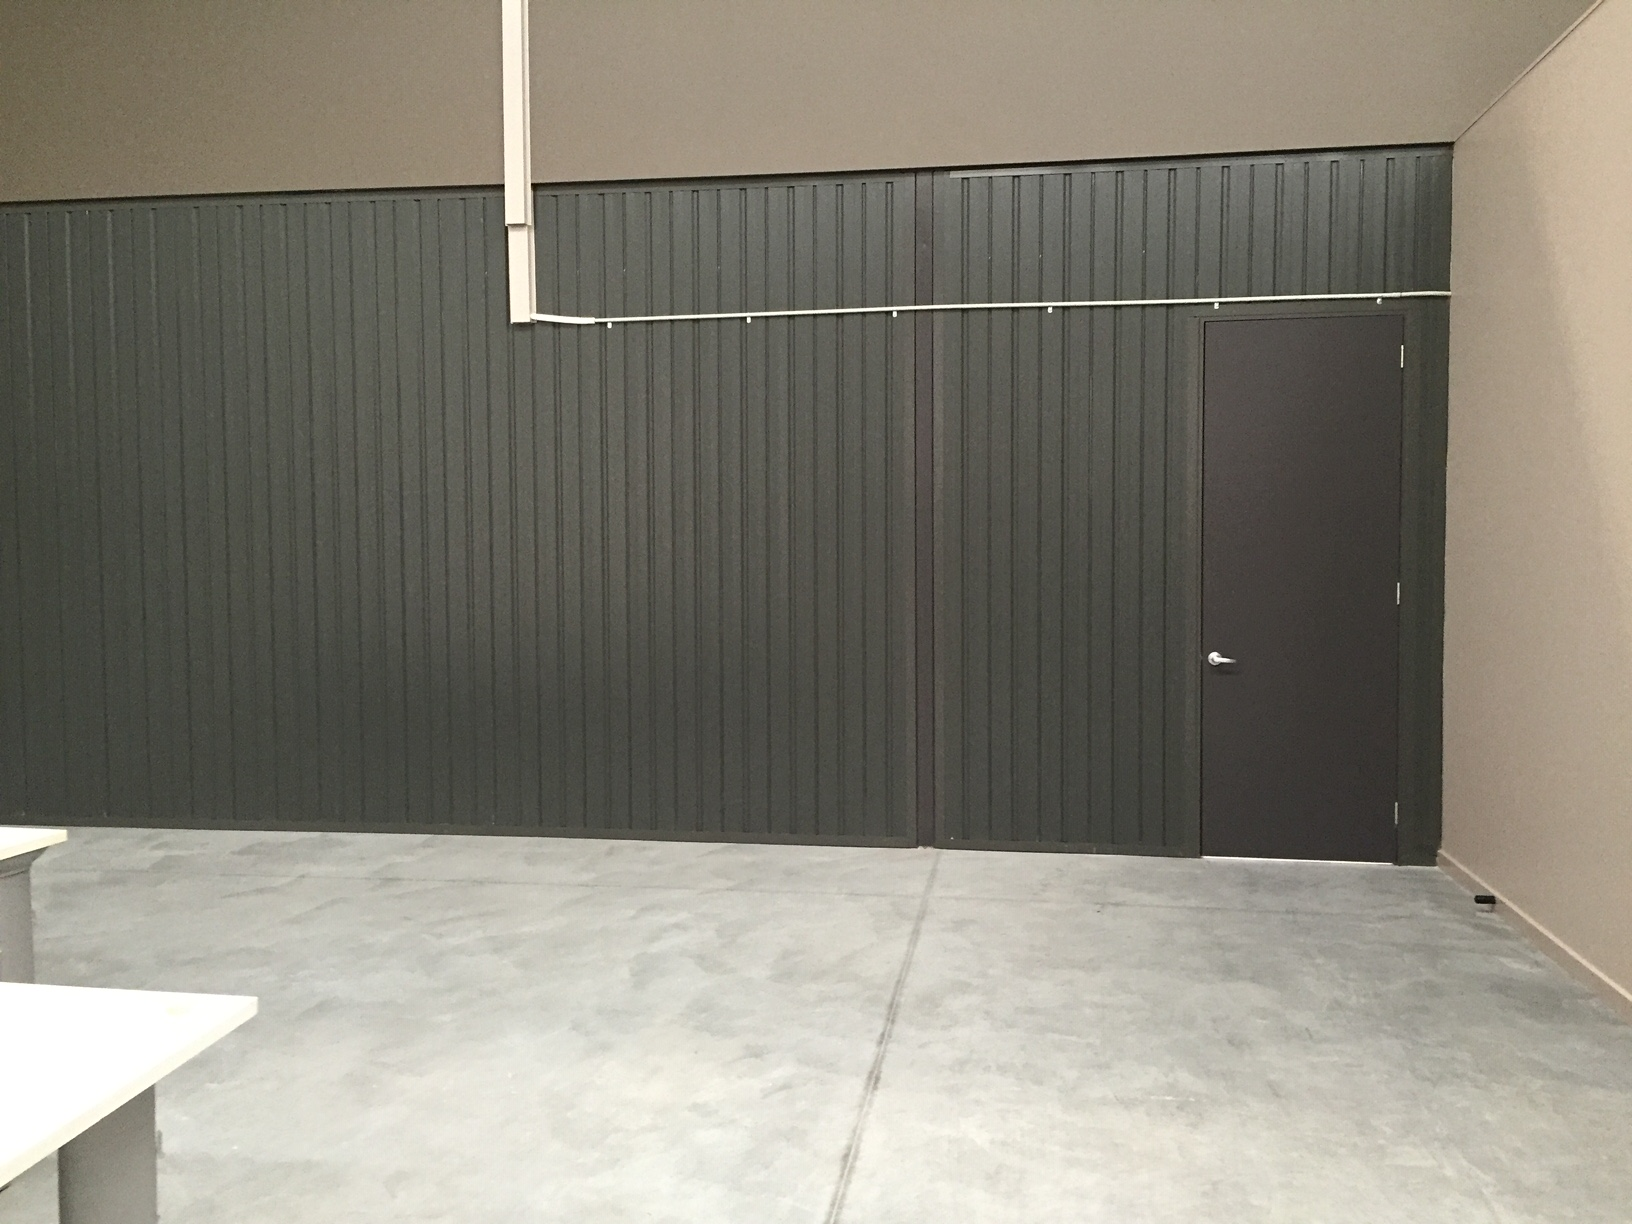 fire retardant walls